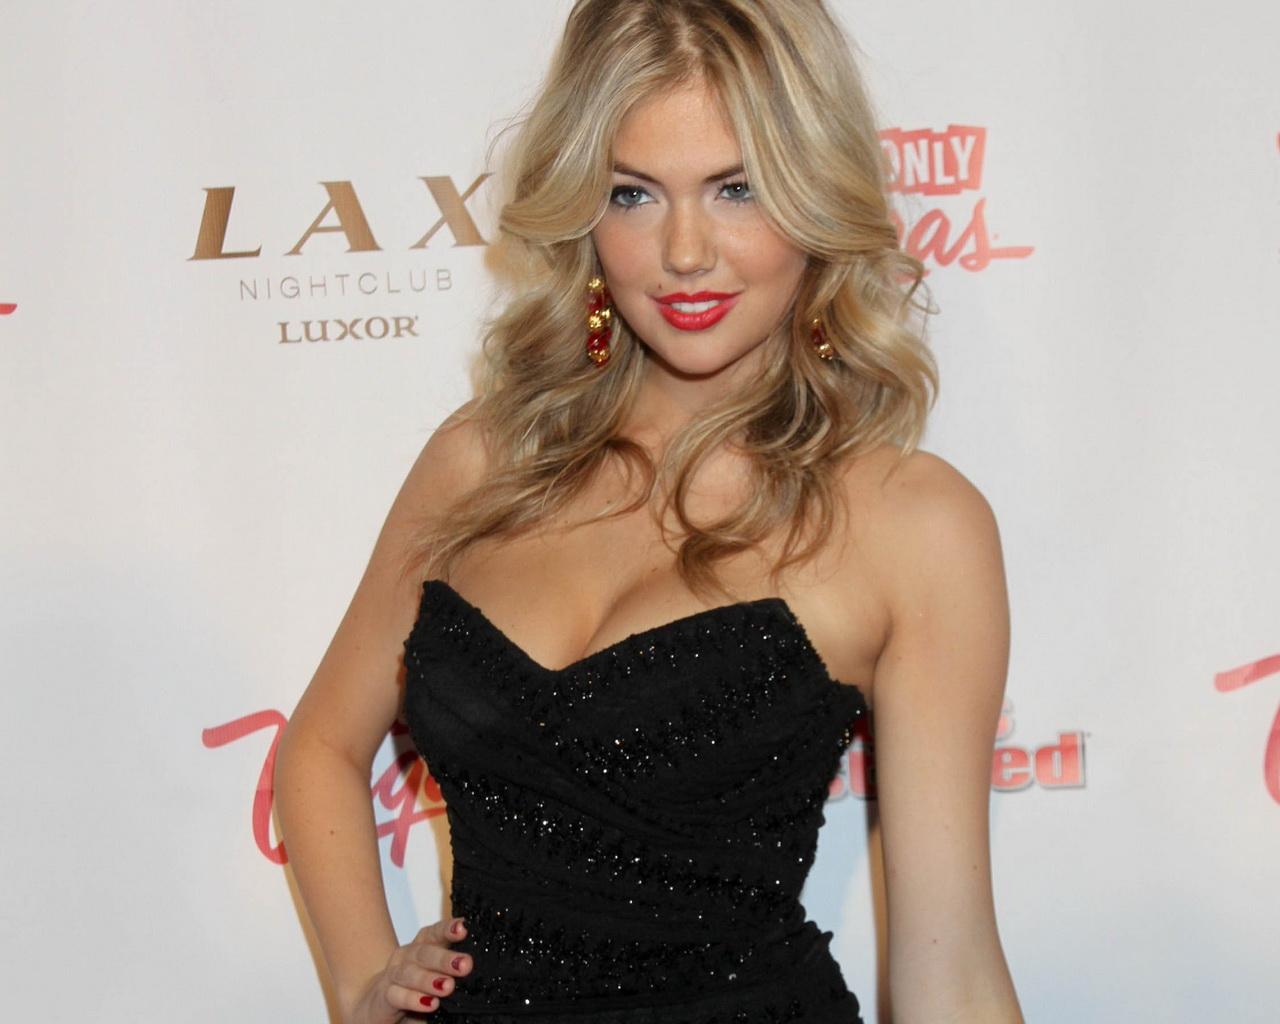 http://4.bp.blogspot.com/-FQiyHvKlIBI/T4rxsW_4mRI/AAAAAAAAGhs/-86hwrK19YU/s1600/Kate+Upton+2+FB.jpg